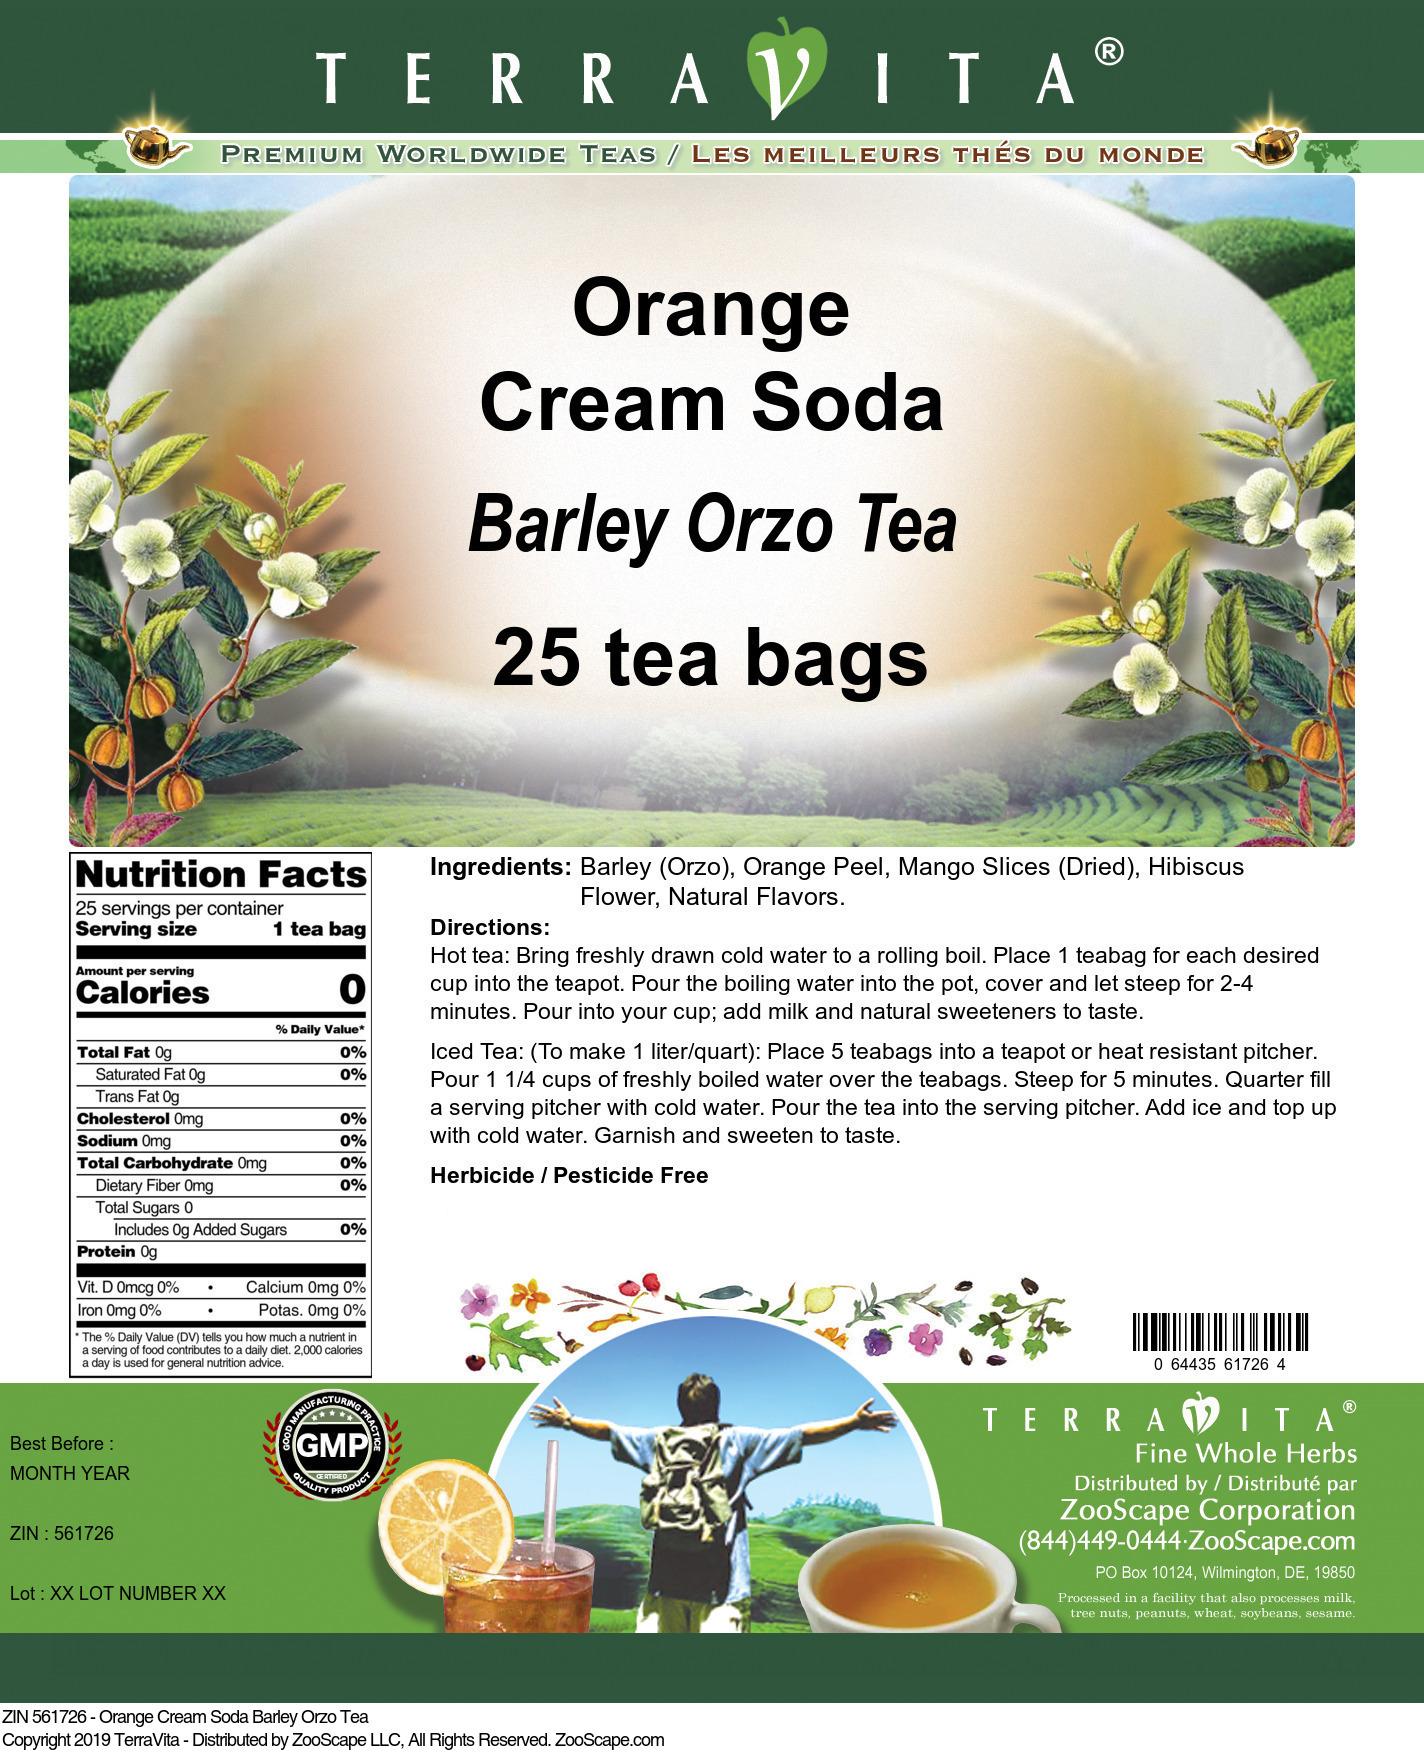 Orange Cream Soda Barley Orzo Tea